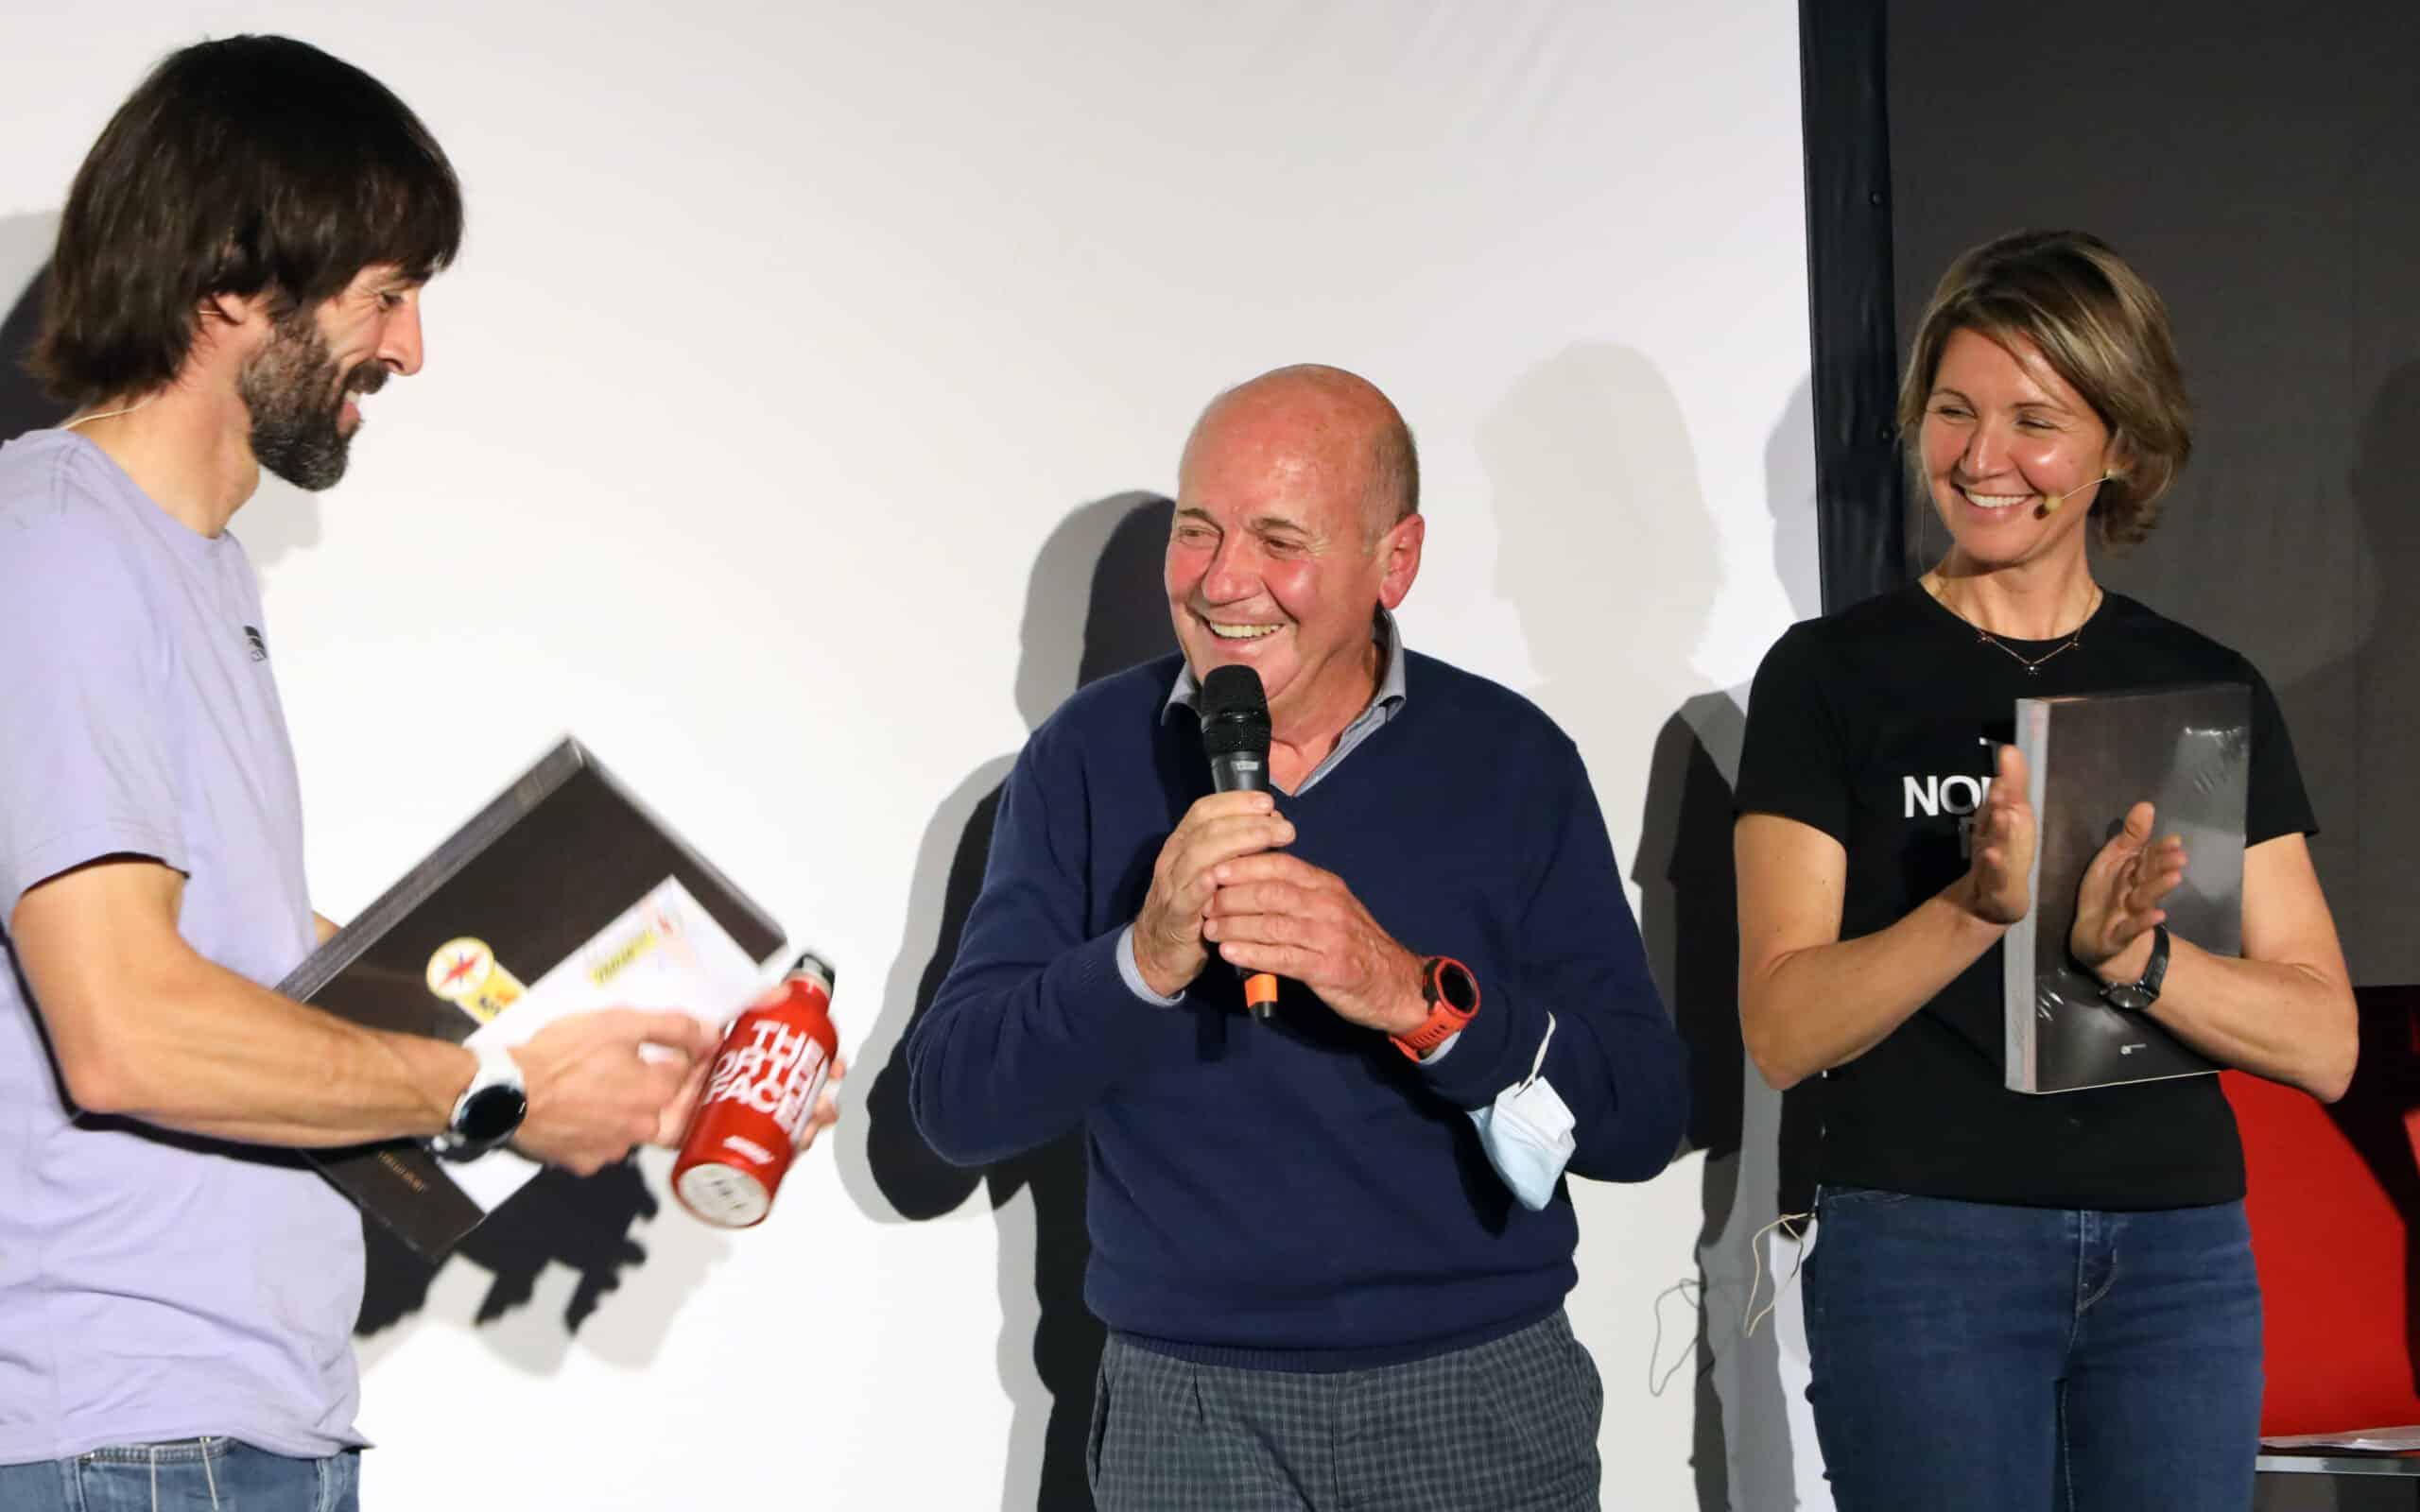 Da sinistra: Hervé Barmasse, Sergio Longoni e Elisa Calcamuggi